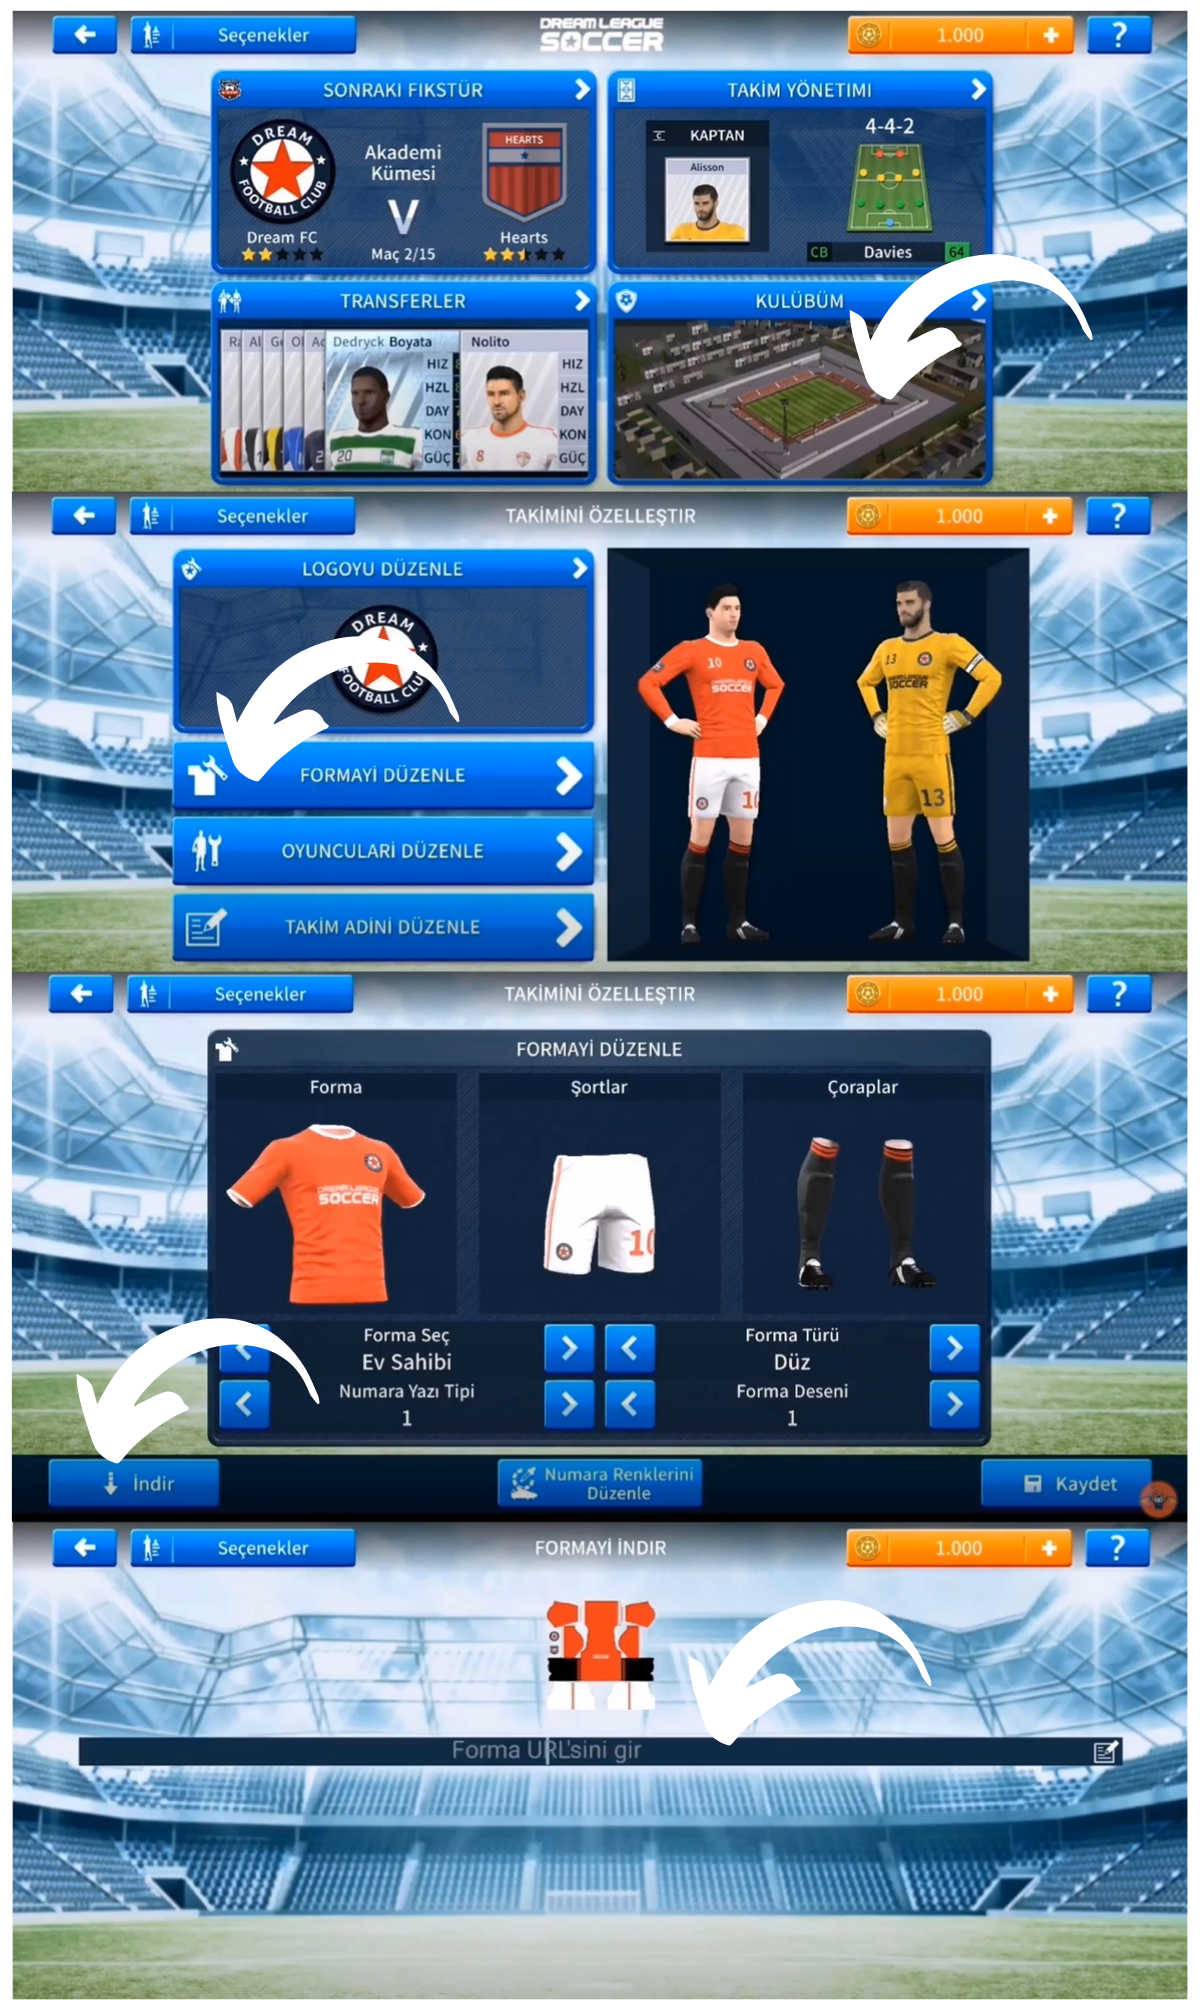 dream-league-soccer-forma-ve-logo-nasil-indirilir-degistirilir.png